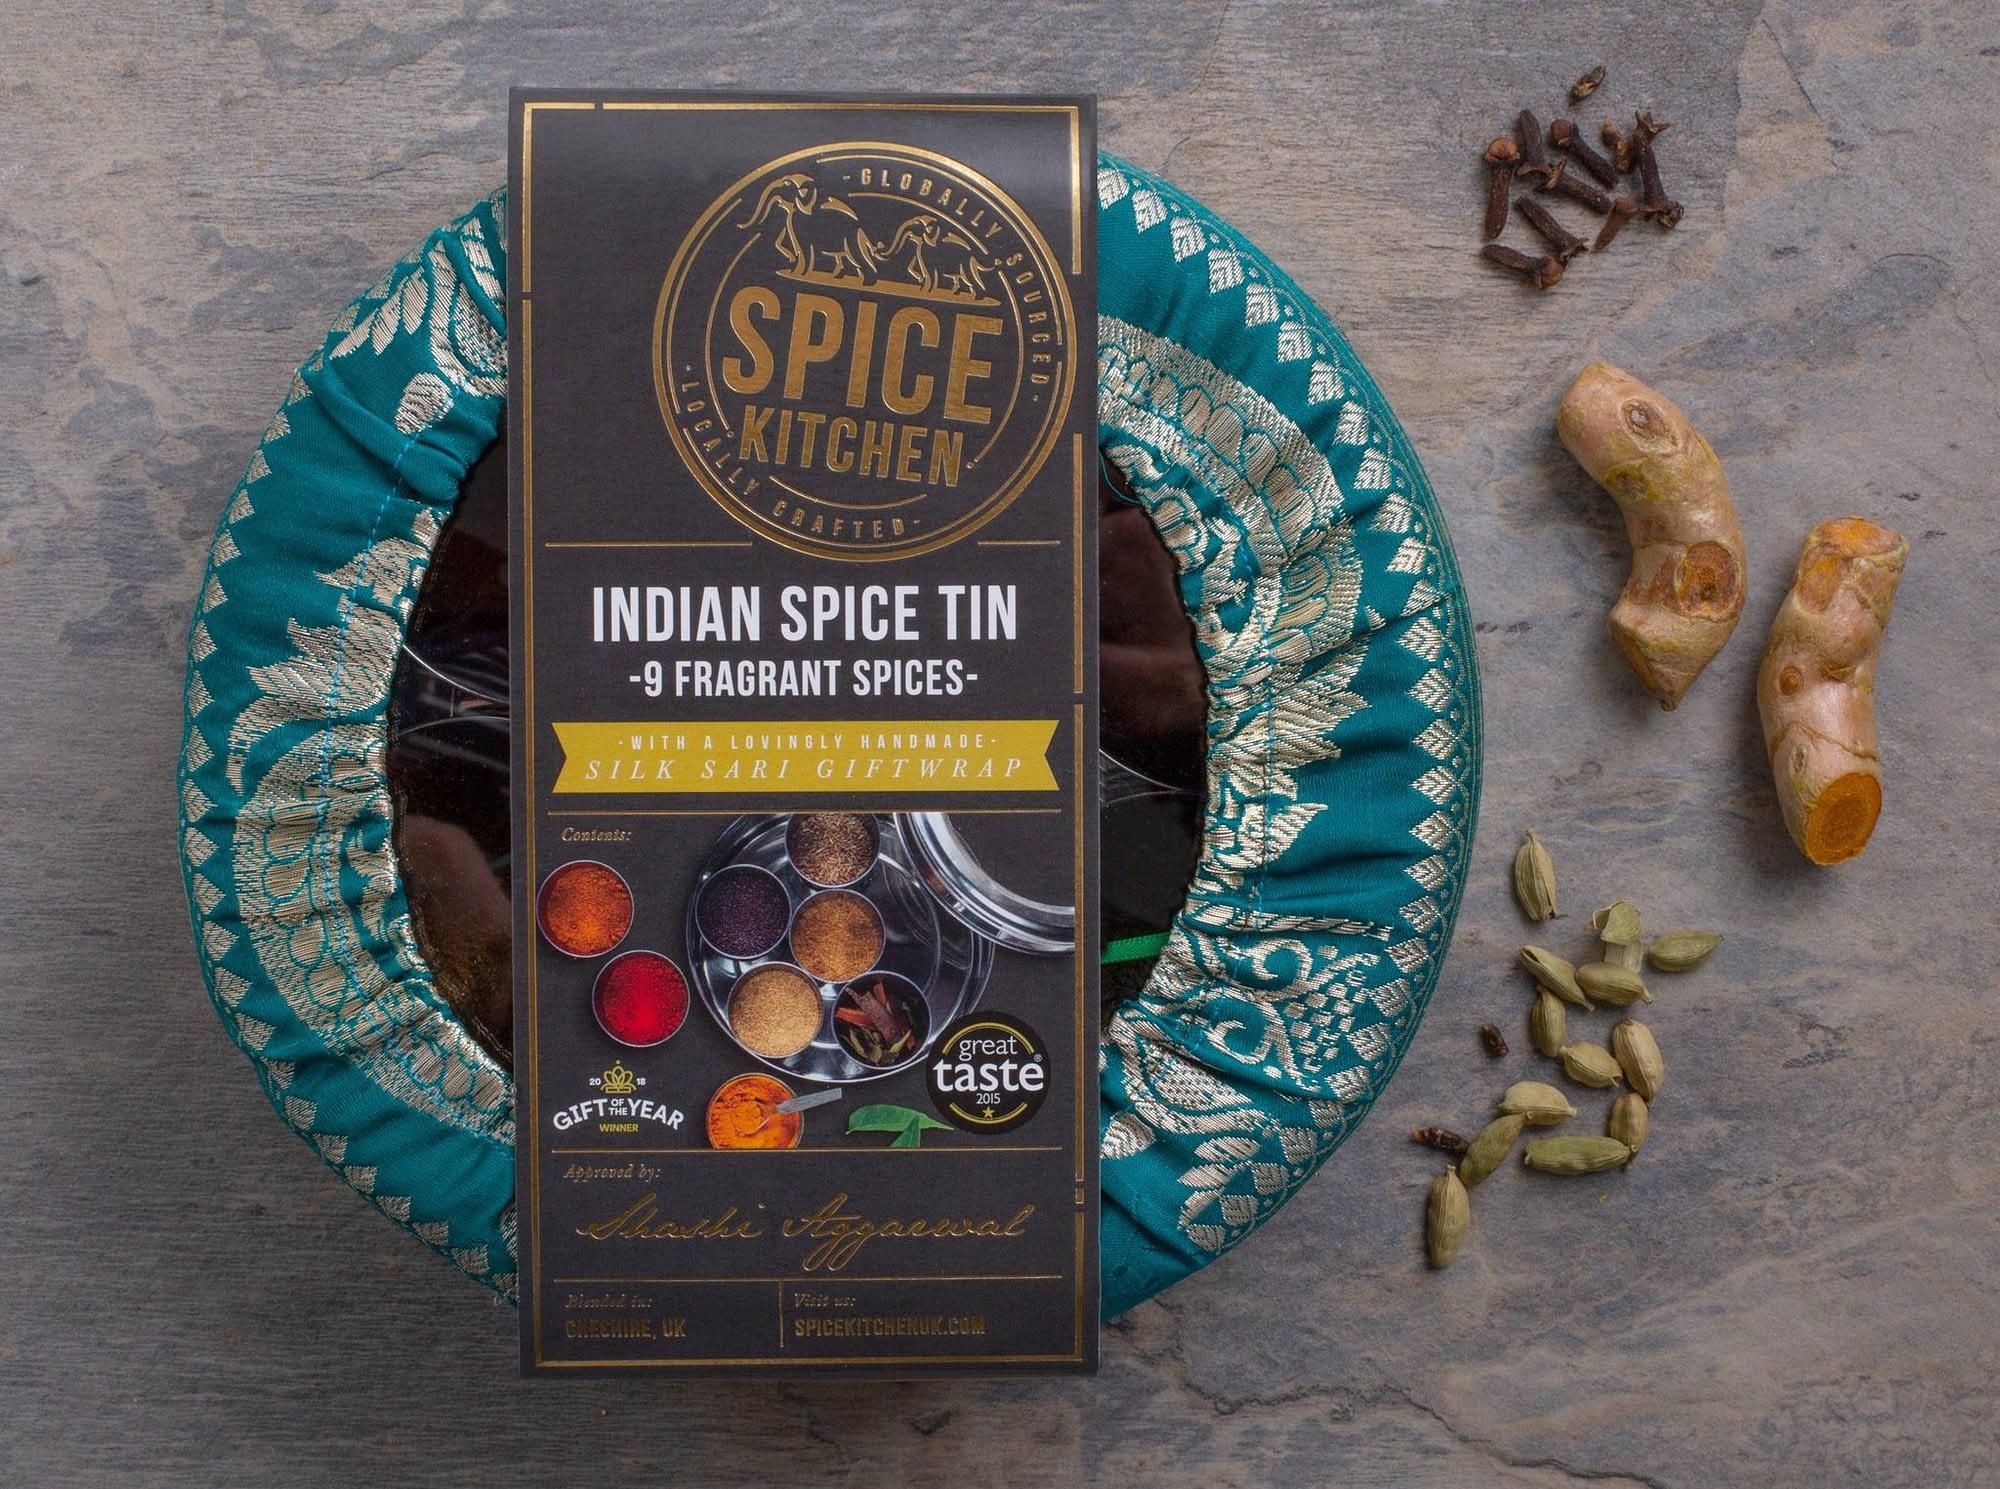 Masala Dabba, Spices, & Sari Wrap from Amazon (Spice Kitchen UK)